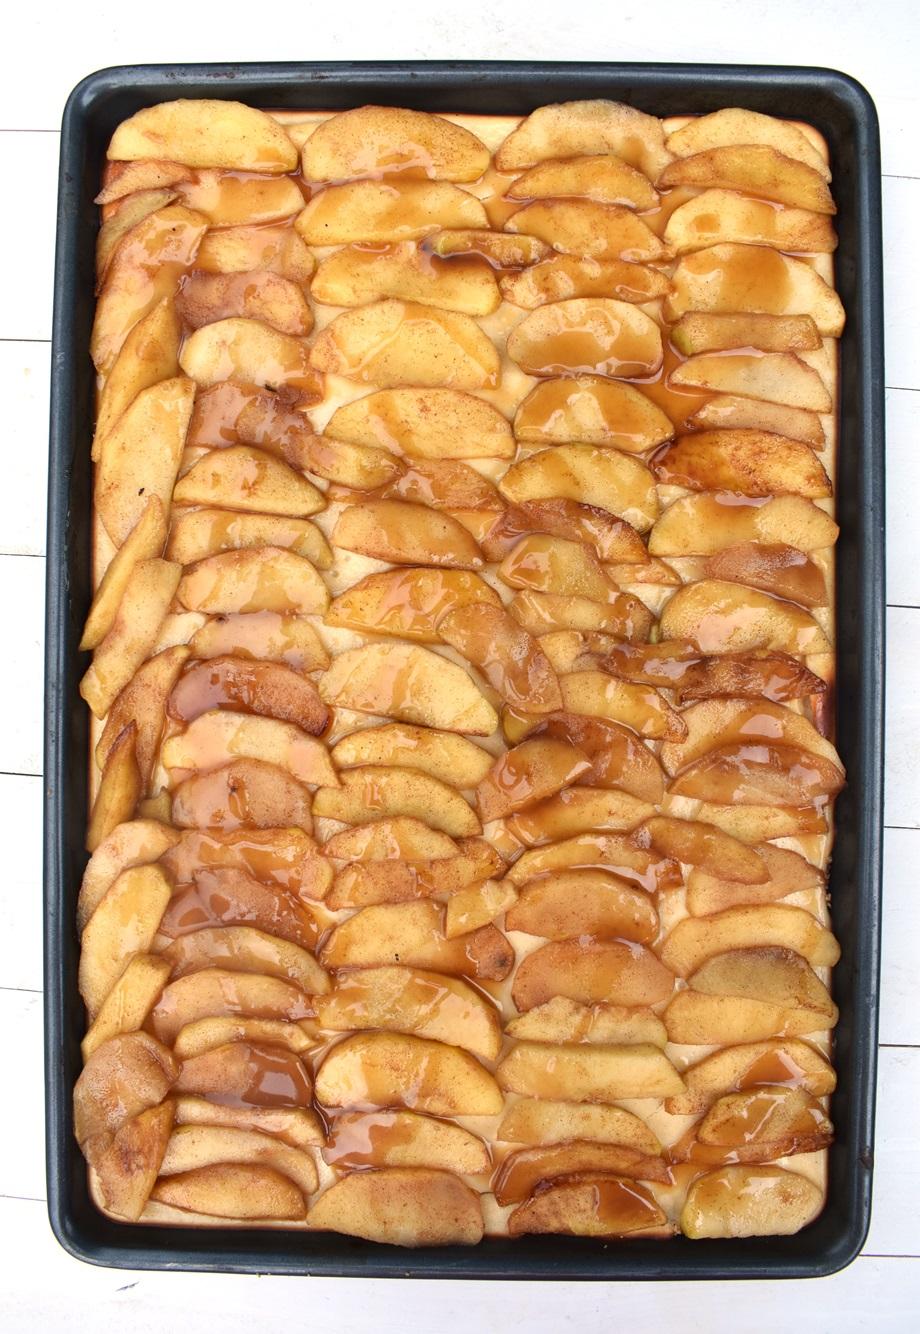 sheet pan of cinnamon apple cheesecake bars